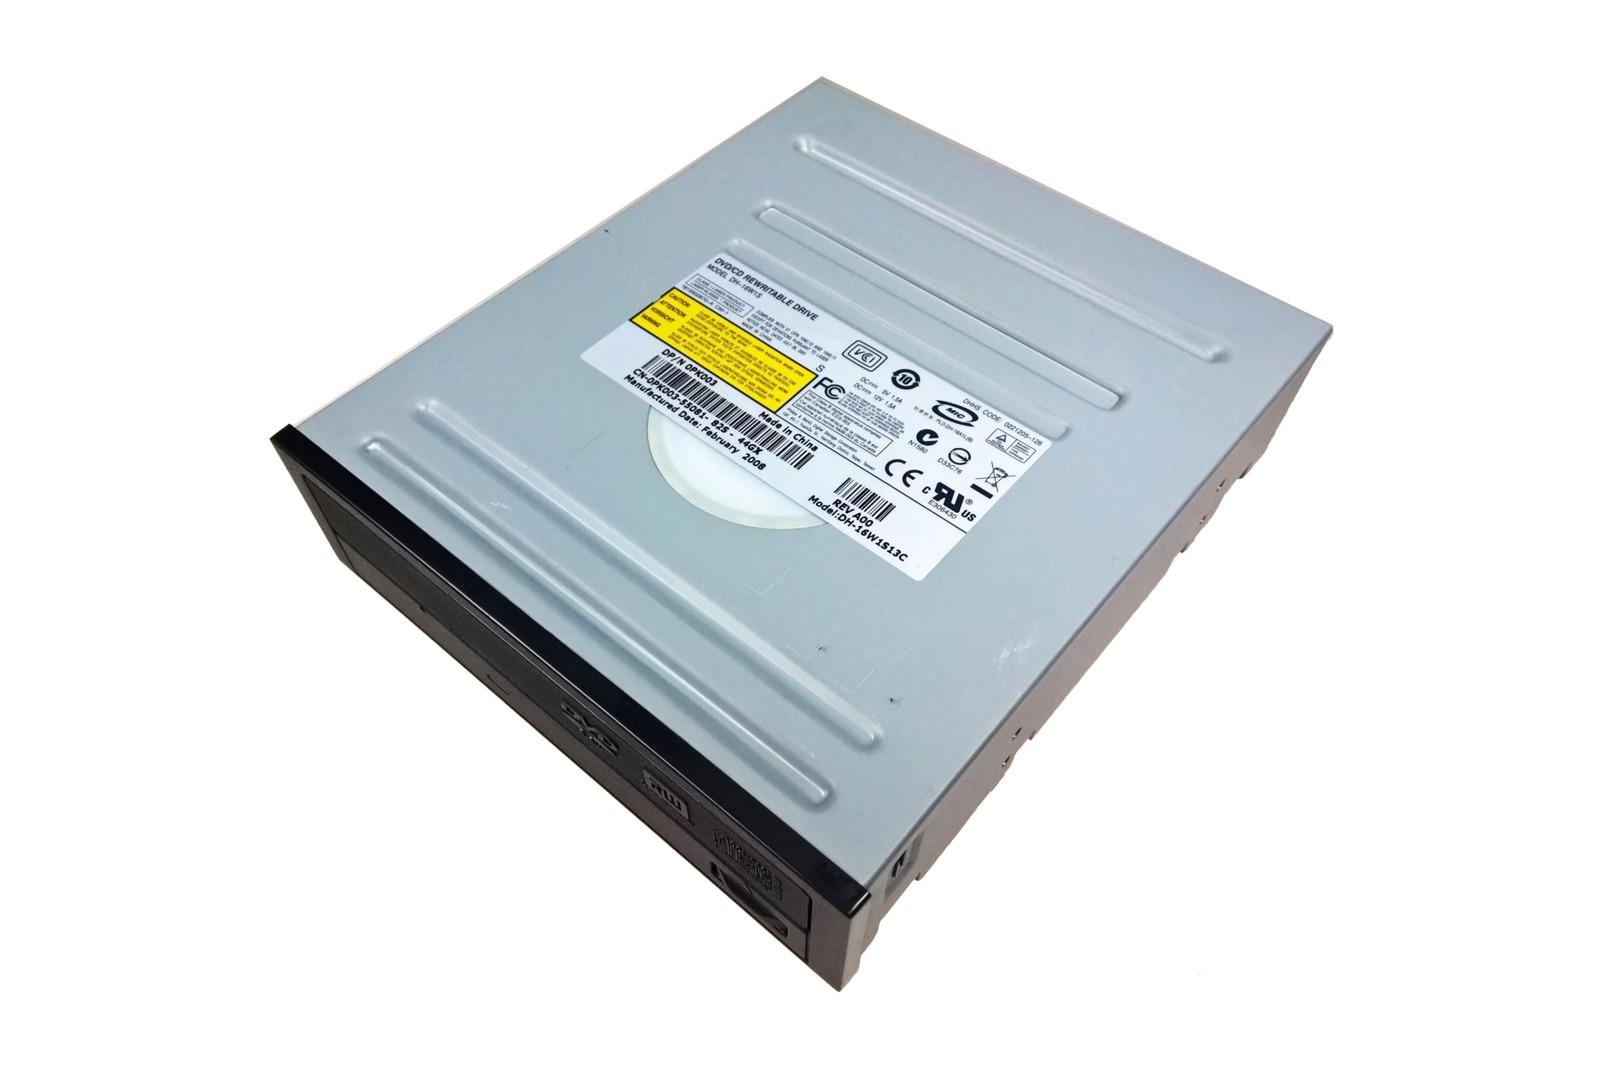 Brenner Philips 16X DVD RW DL CD-RW SATA DH-16W1S SATA